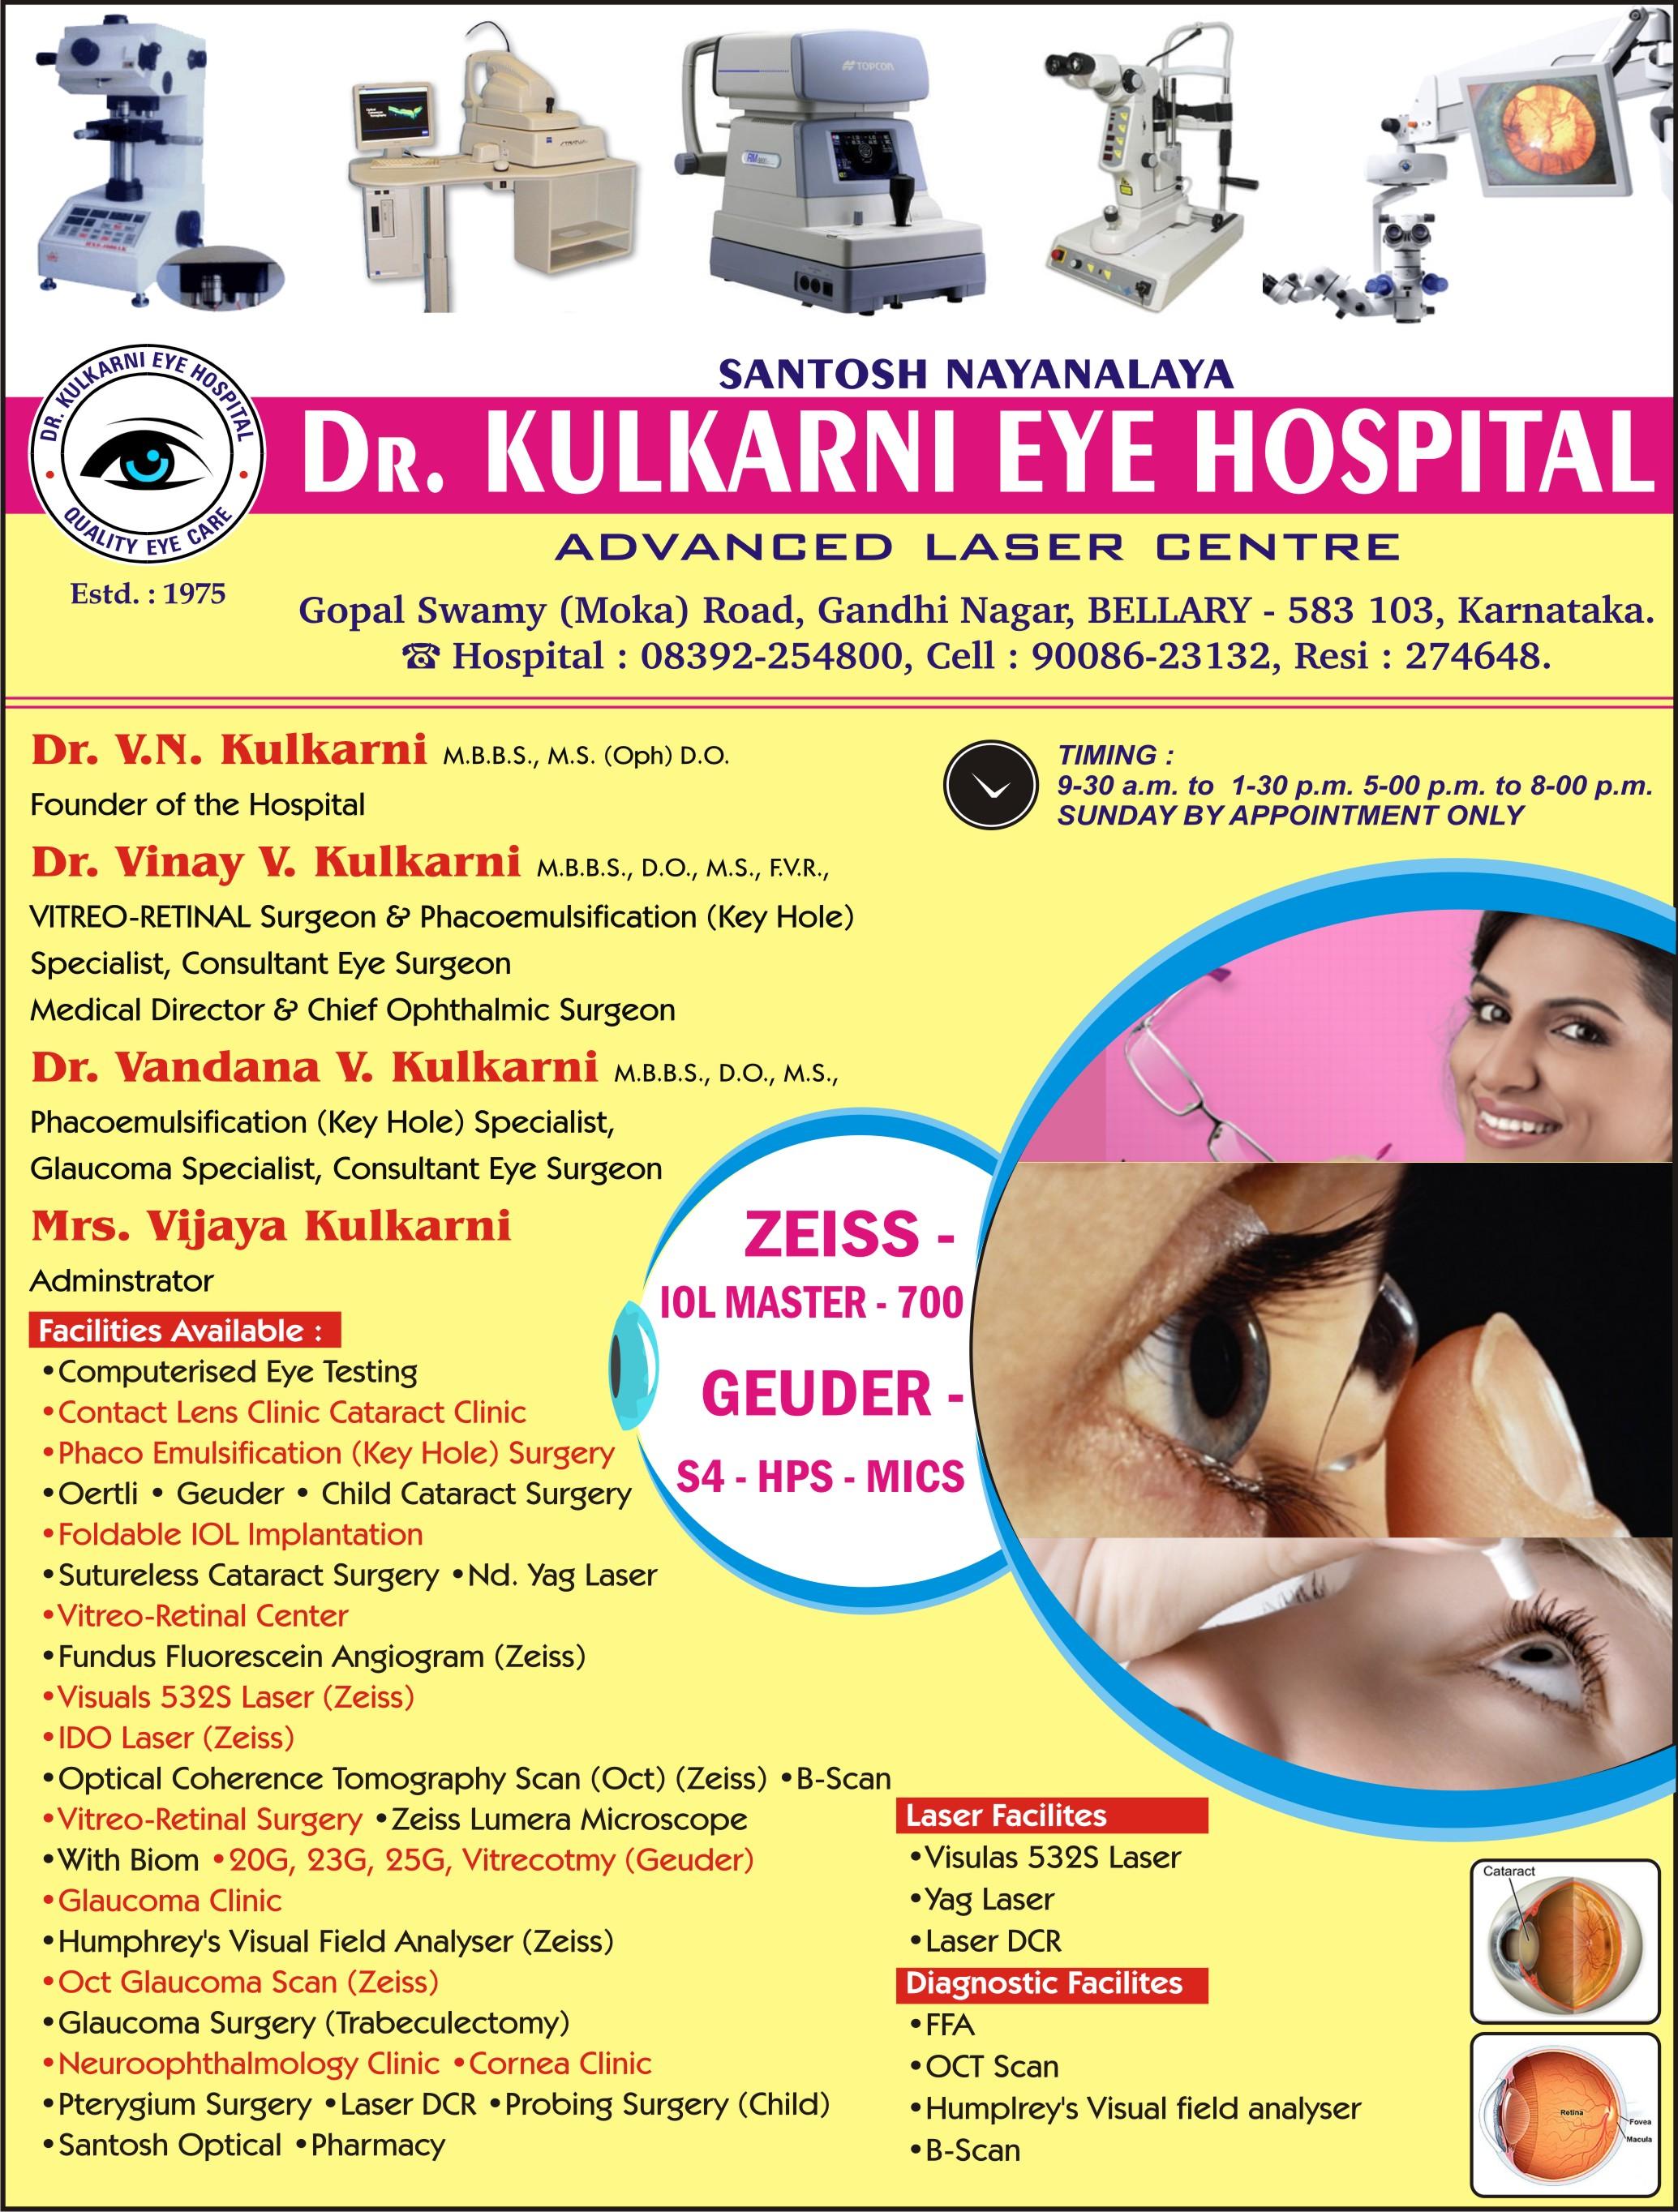 Dr. Kulkarni Eye Hospital